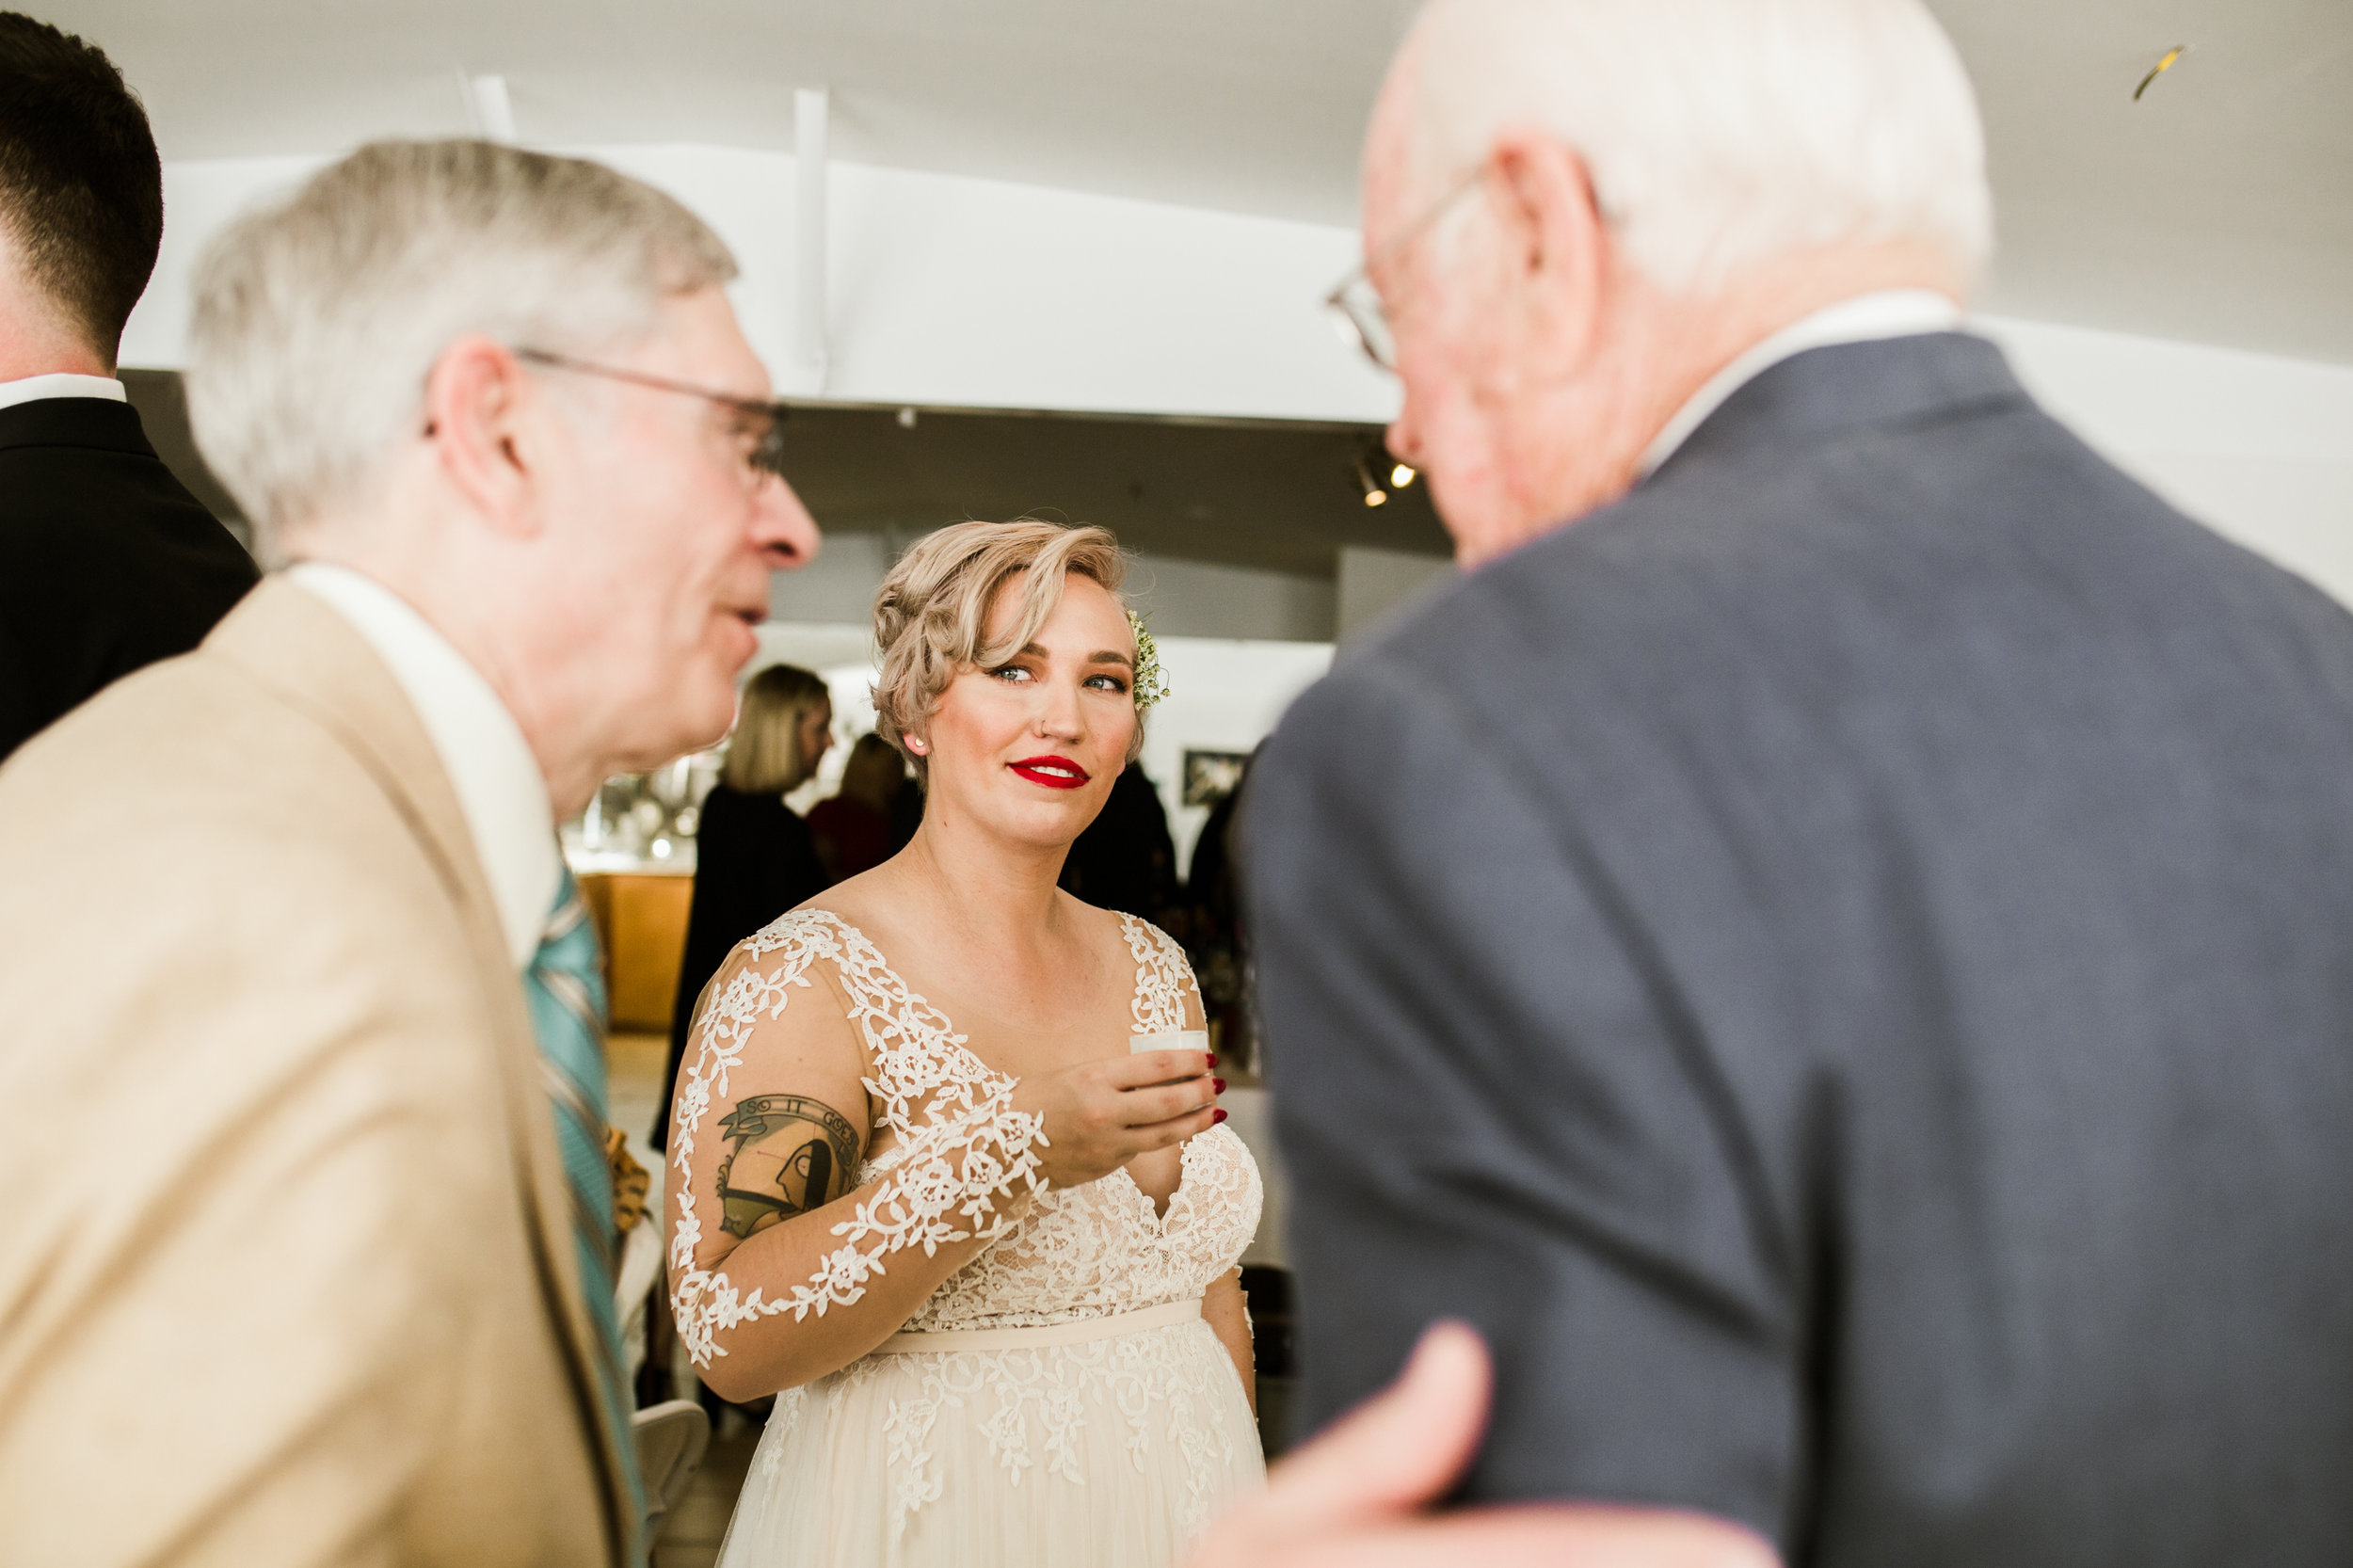 Kentucky Wedding Louisville Wedding Photographer 2018 Crystal Ludwick Photo Louisville Wedding Photographer Kentucky Wedding Photographer (70 of 105).jpg